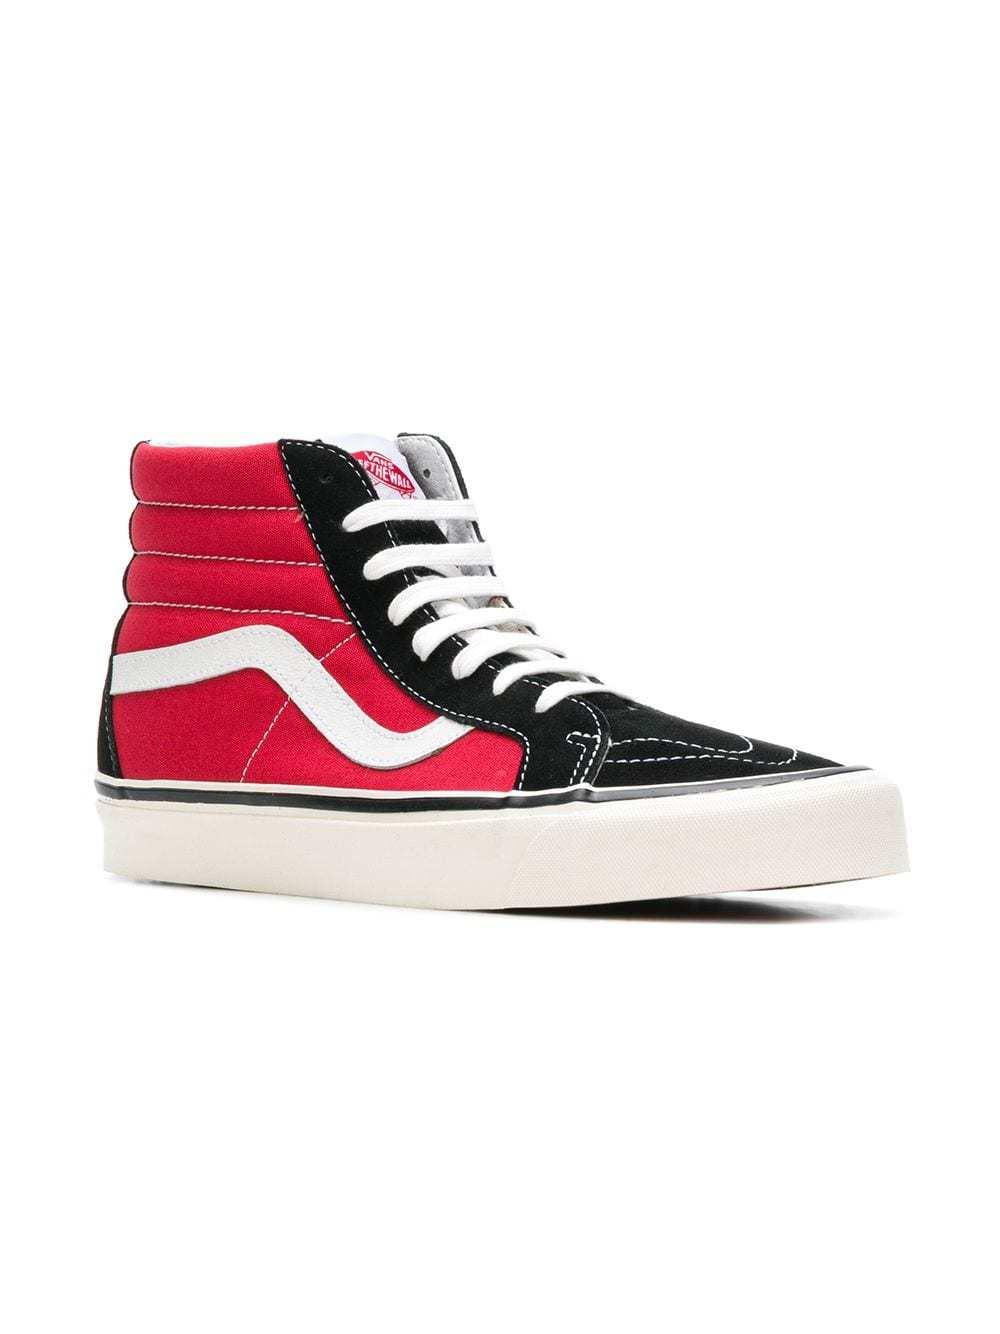 Vans Sk8 Hi Top Sneakers, $117